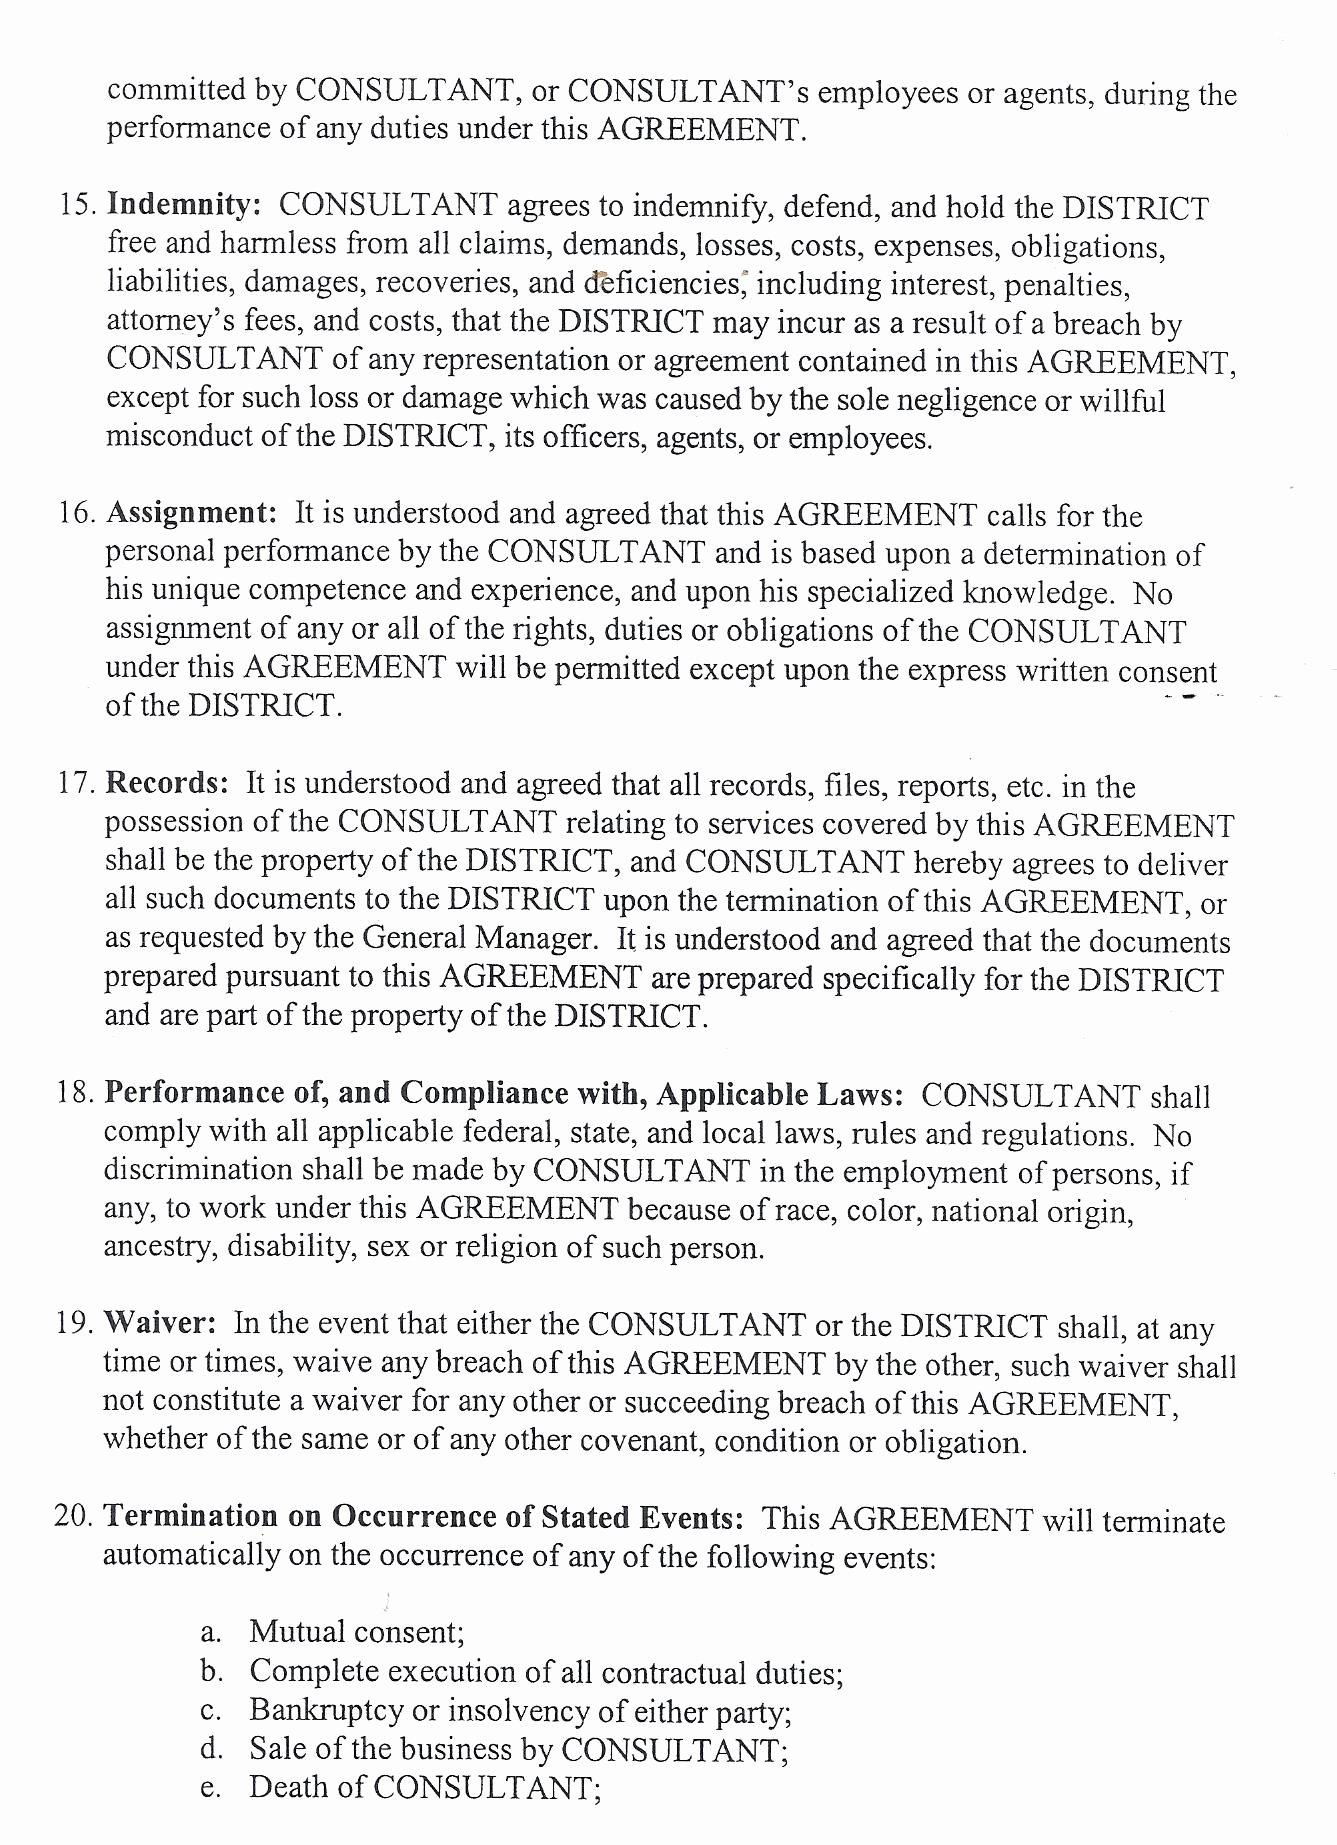 Resume In Paragraph form Elegant Resume Paragraph format 4 Paragraph Essay Outline File